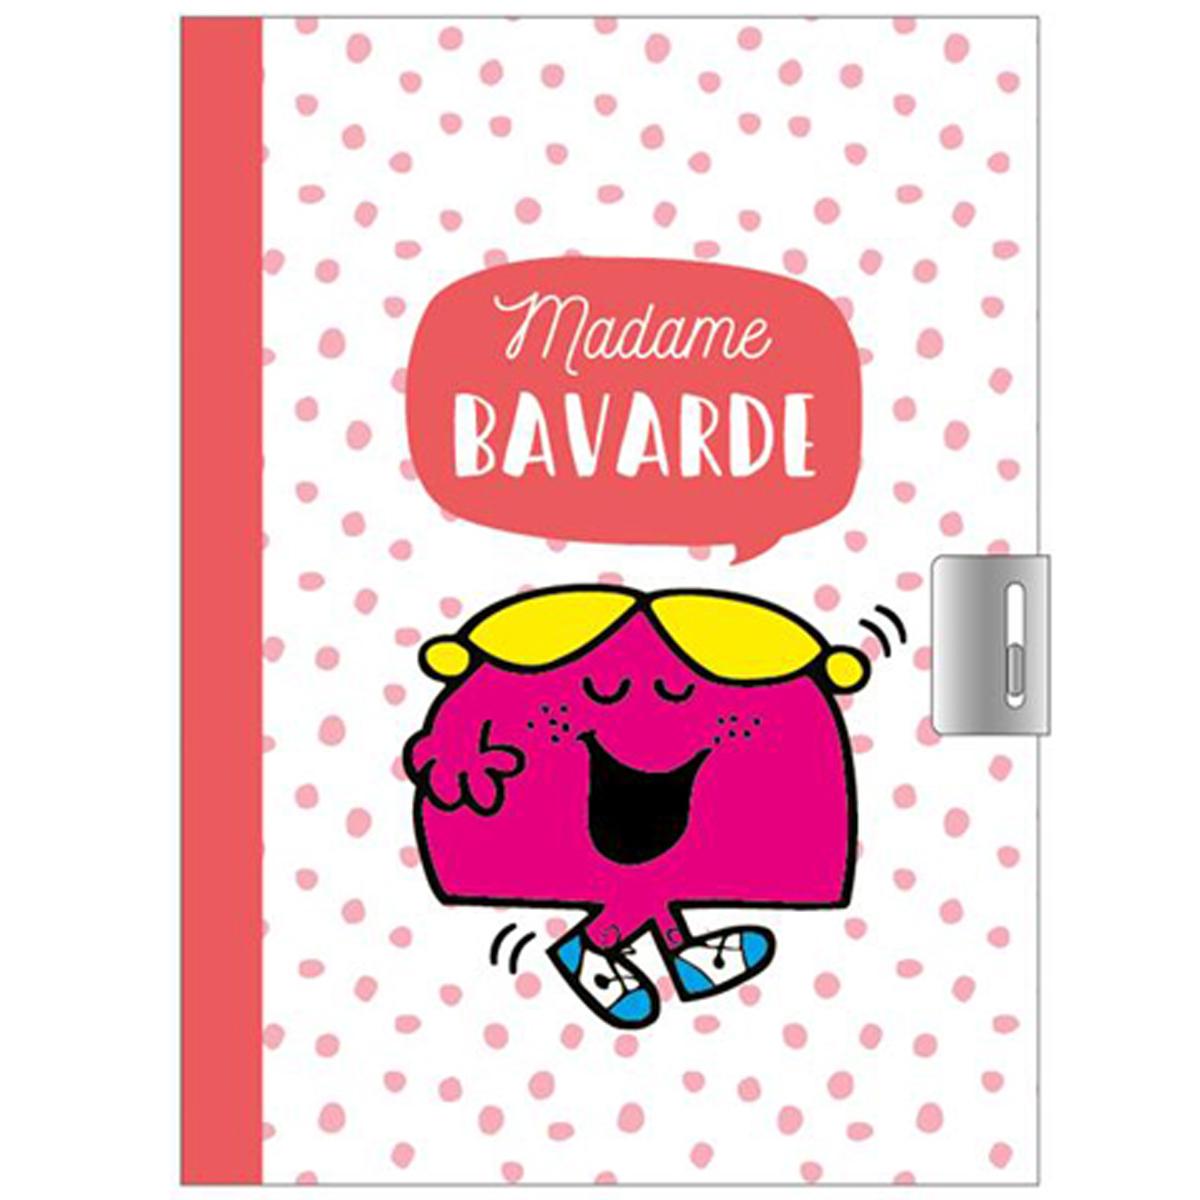 Journal Intime \'Monsieur Madame\' orange (Mme Bavarde) - 17x125 cm - [Q9000]